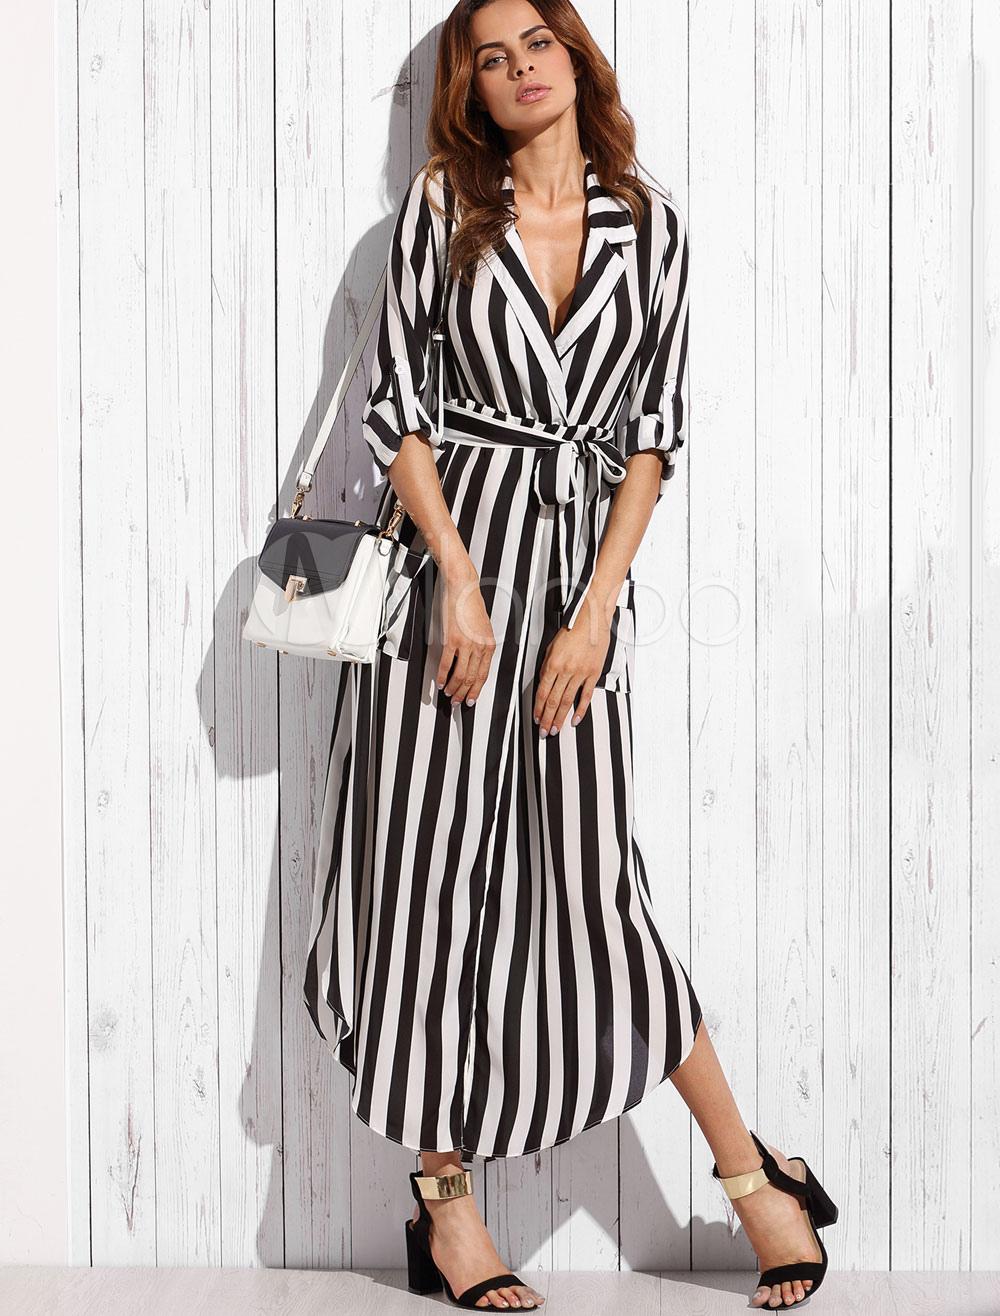 5b93df941cc Chiffon Maxi Dress Black Turndown Collar Long Sleeve Striped Shirt Dress  With Sash-No. 12. 30%OFF. Color Black